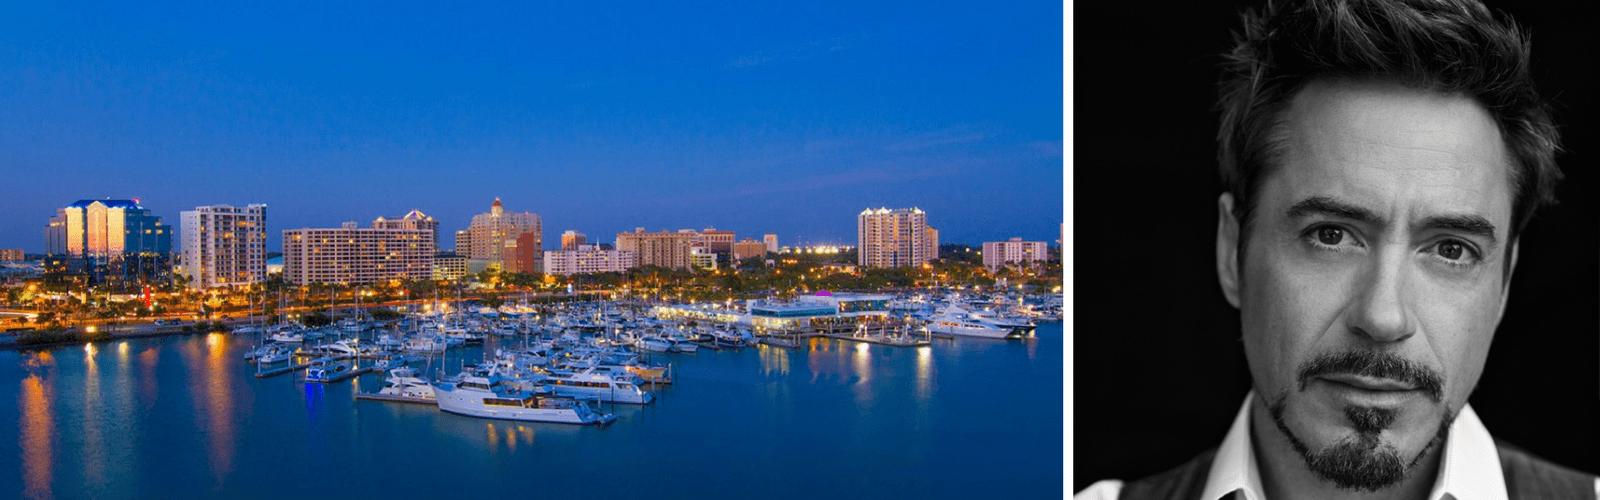 Sarasota Skyline Condos